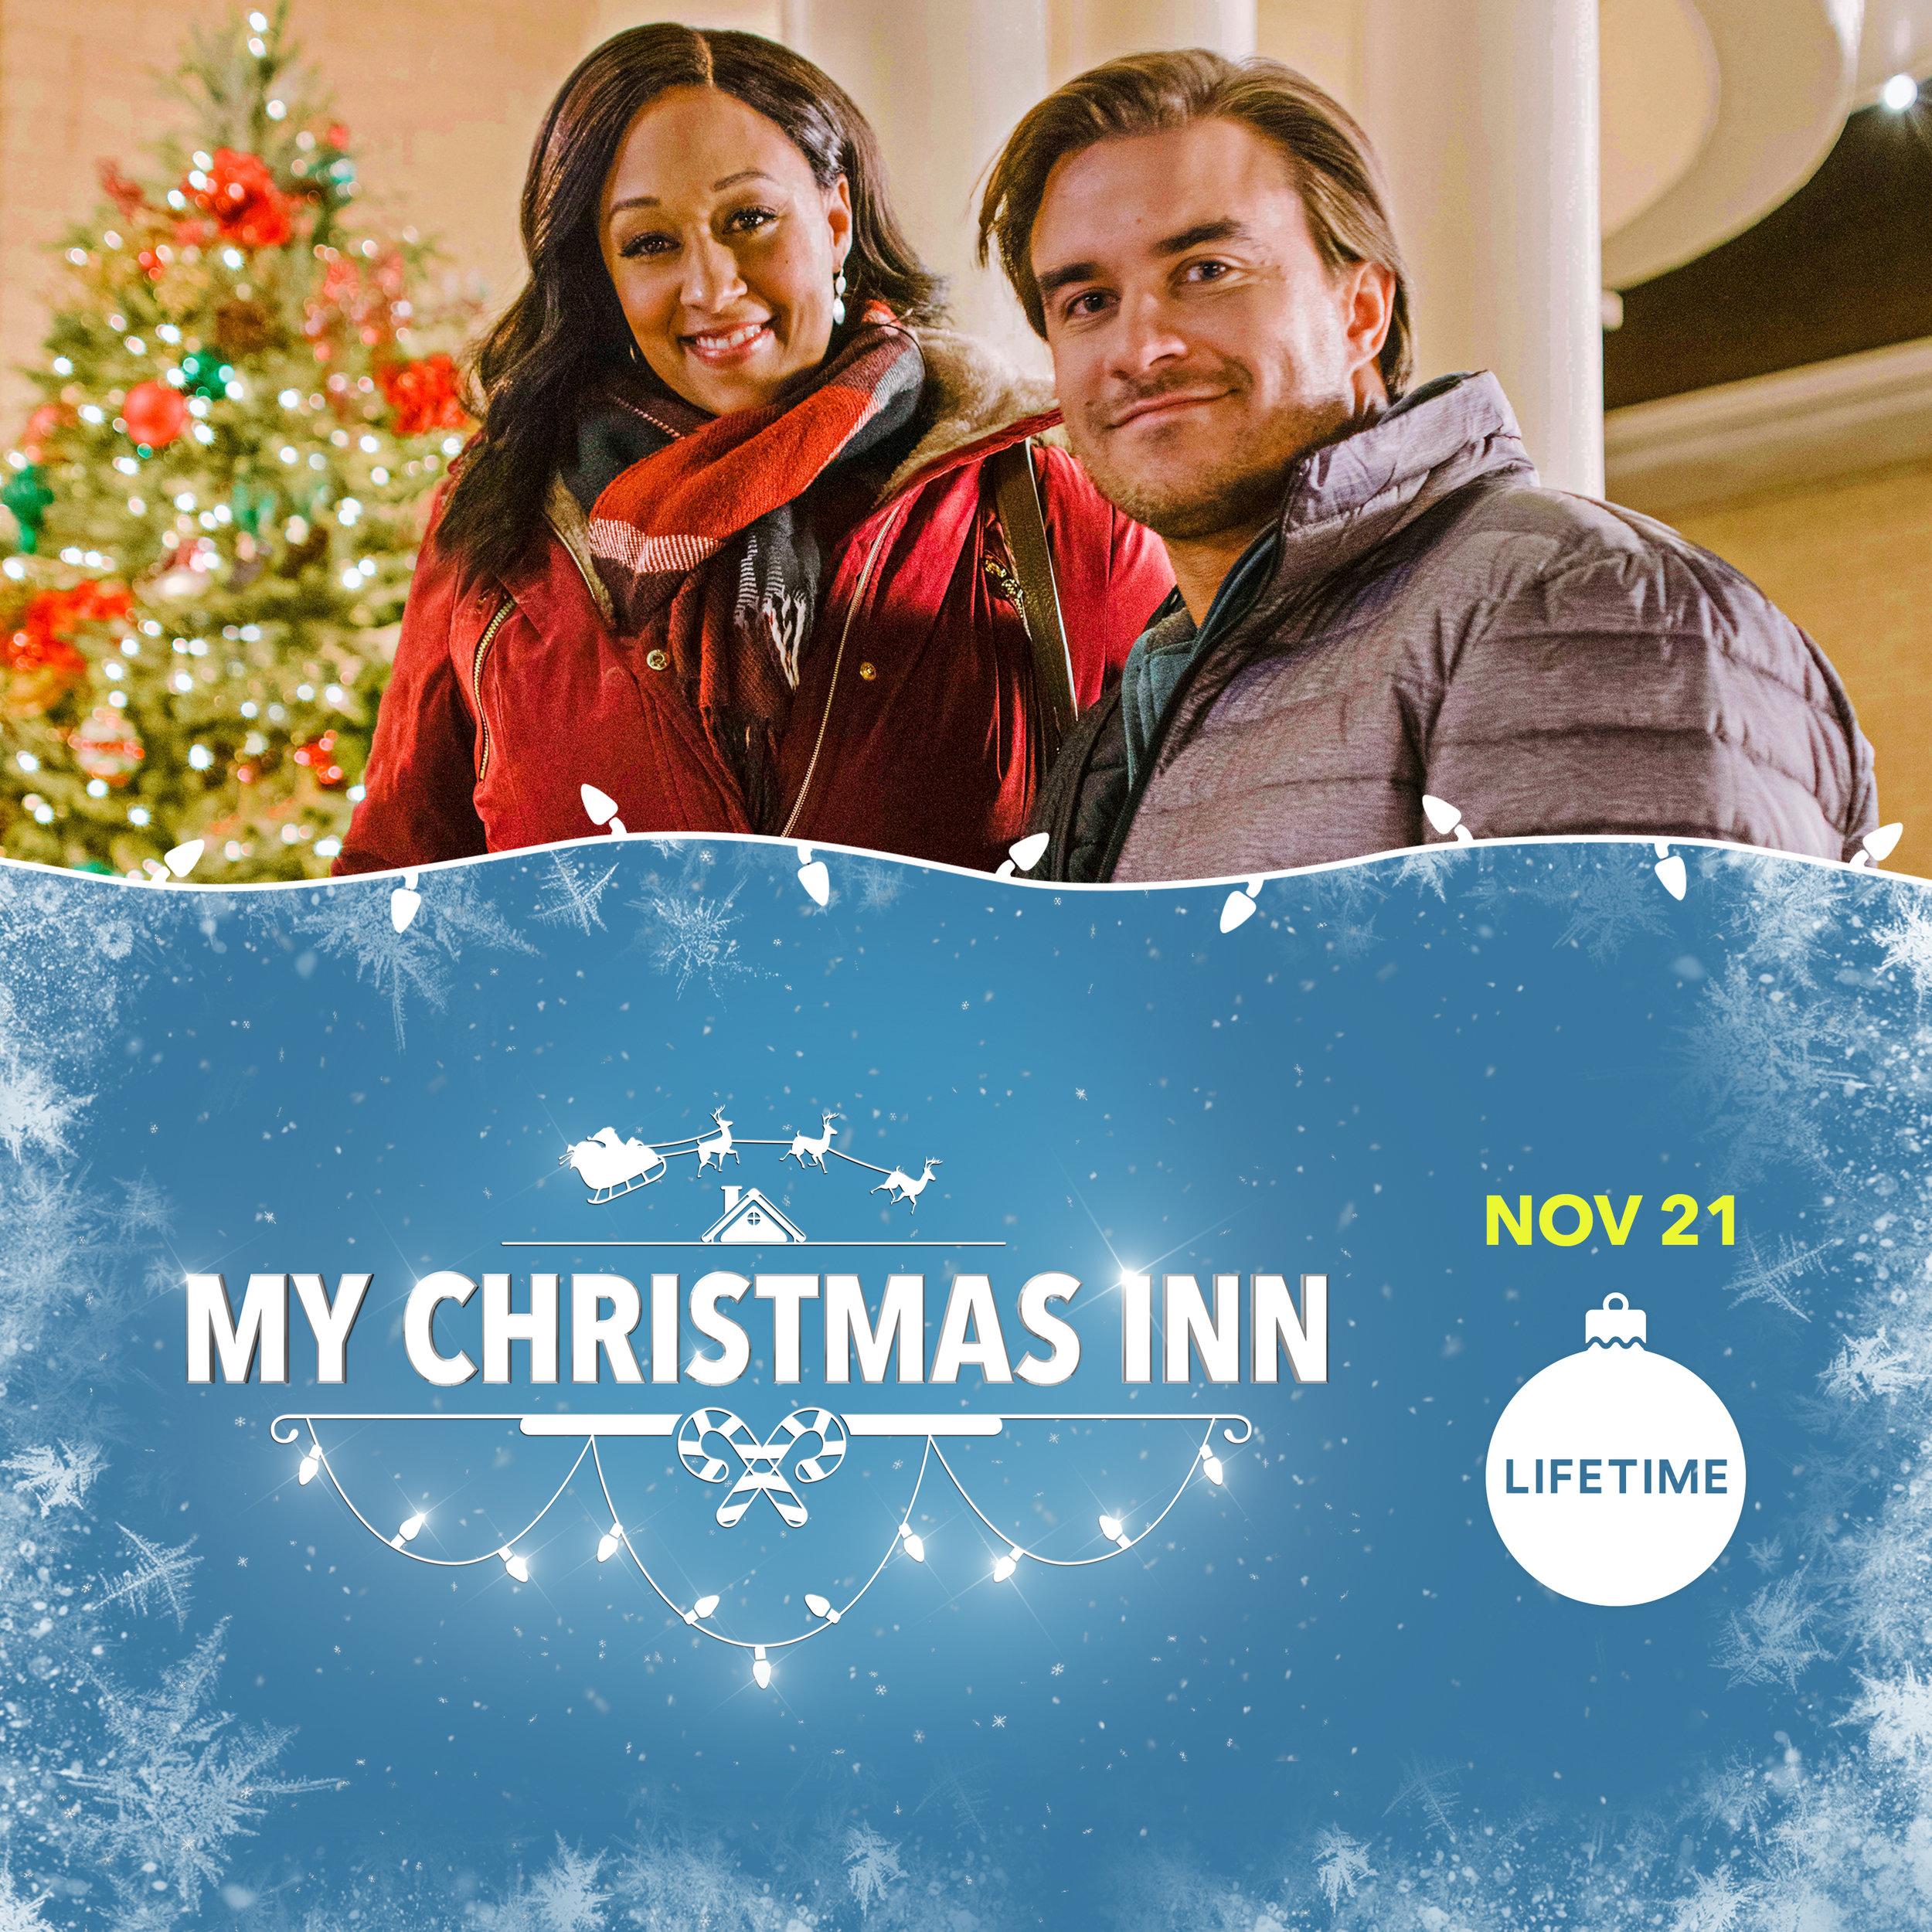 IAWL_My_Christmas_Inn_3000x3000_Prem.jpg